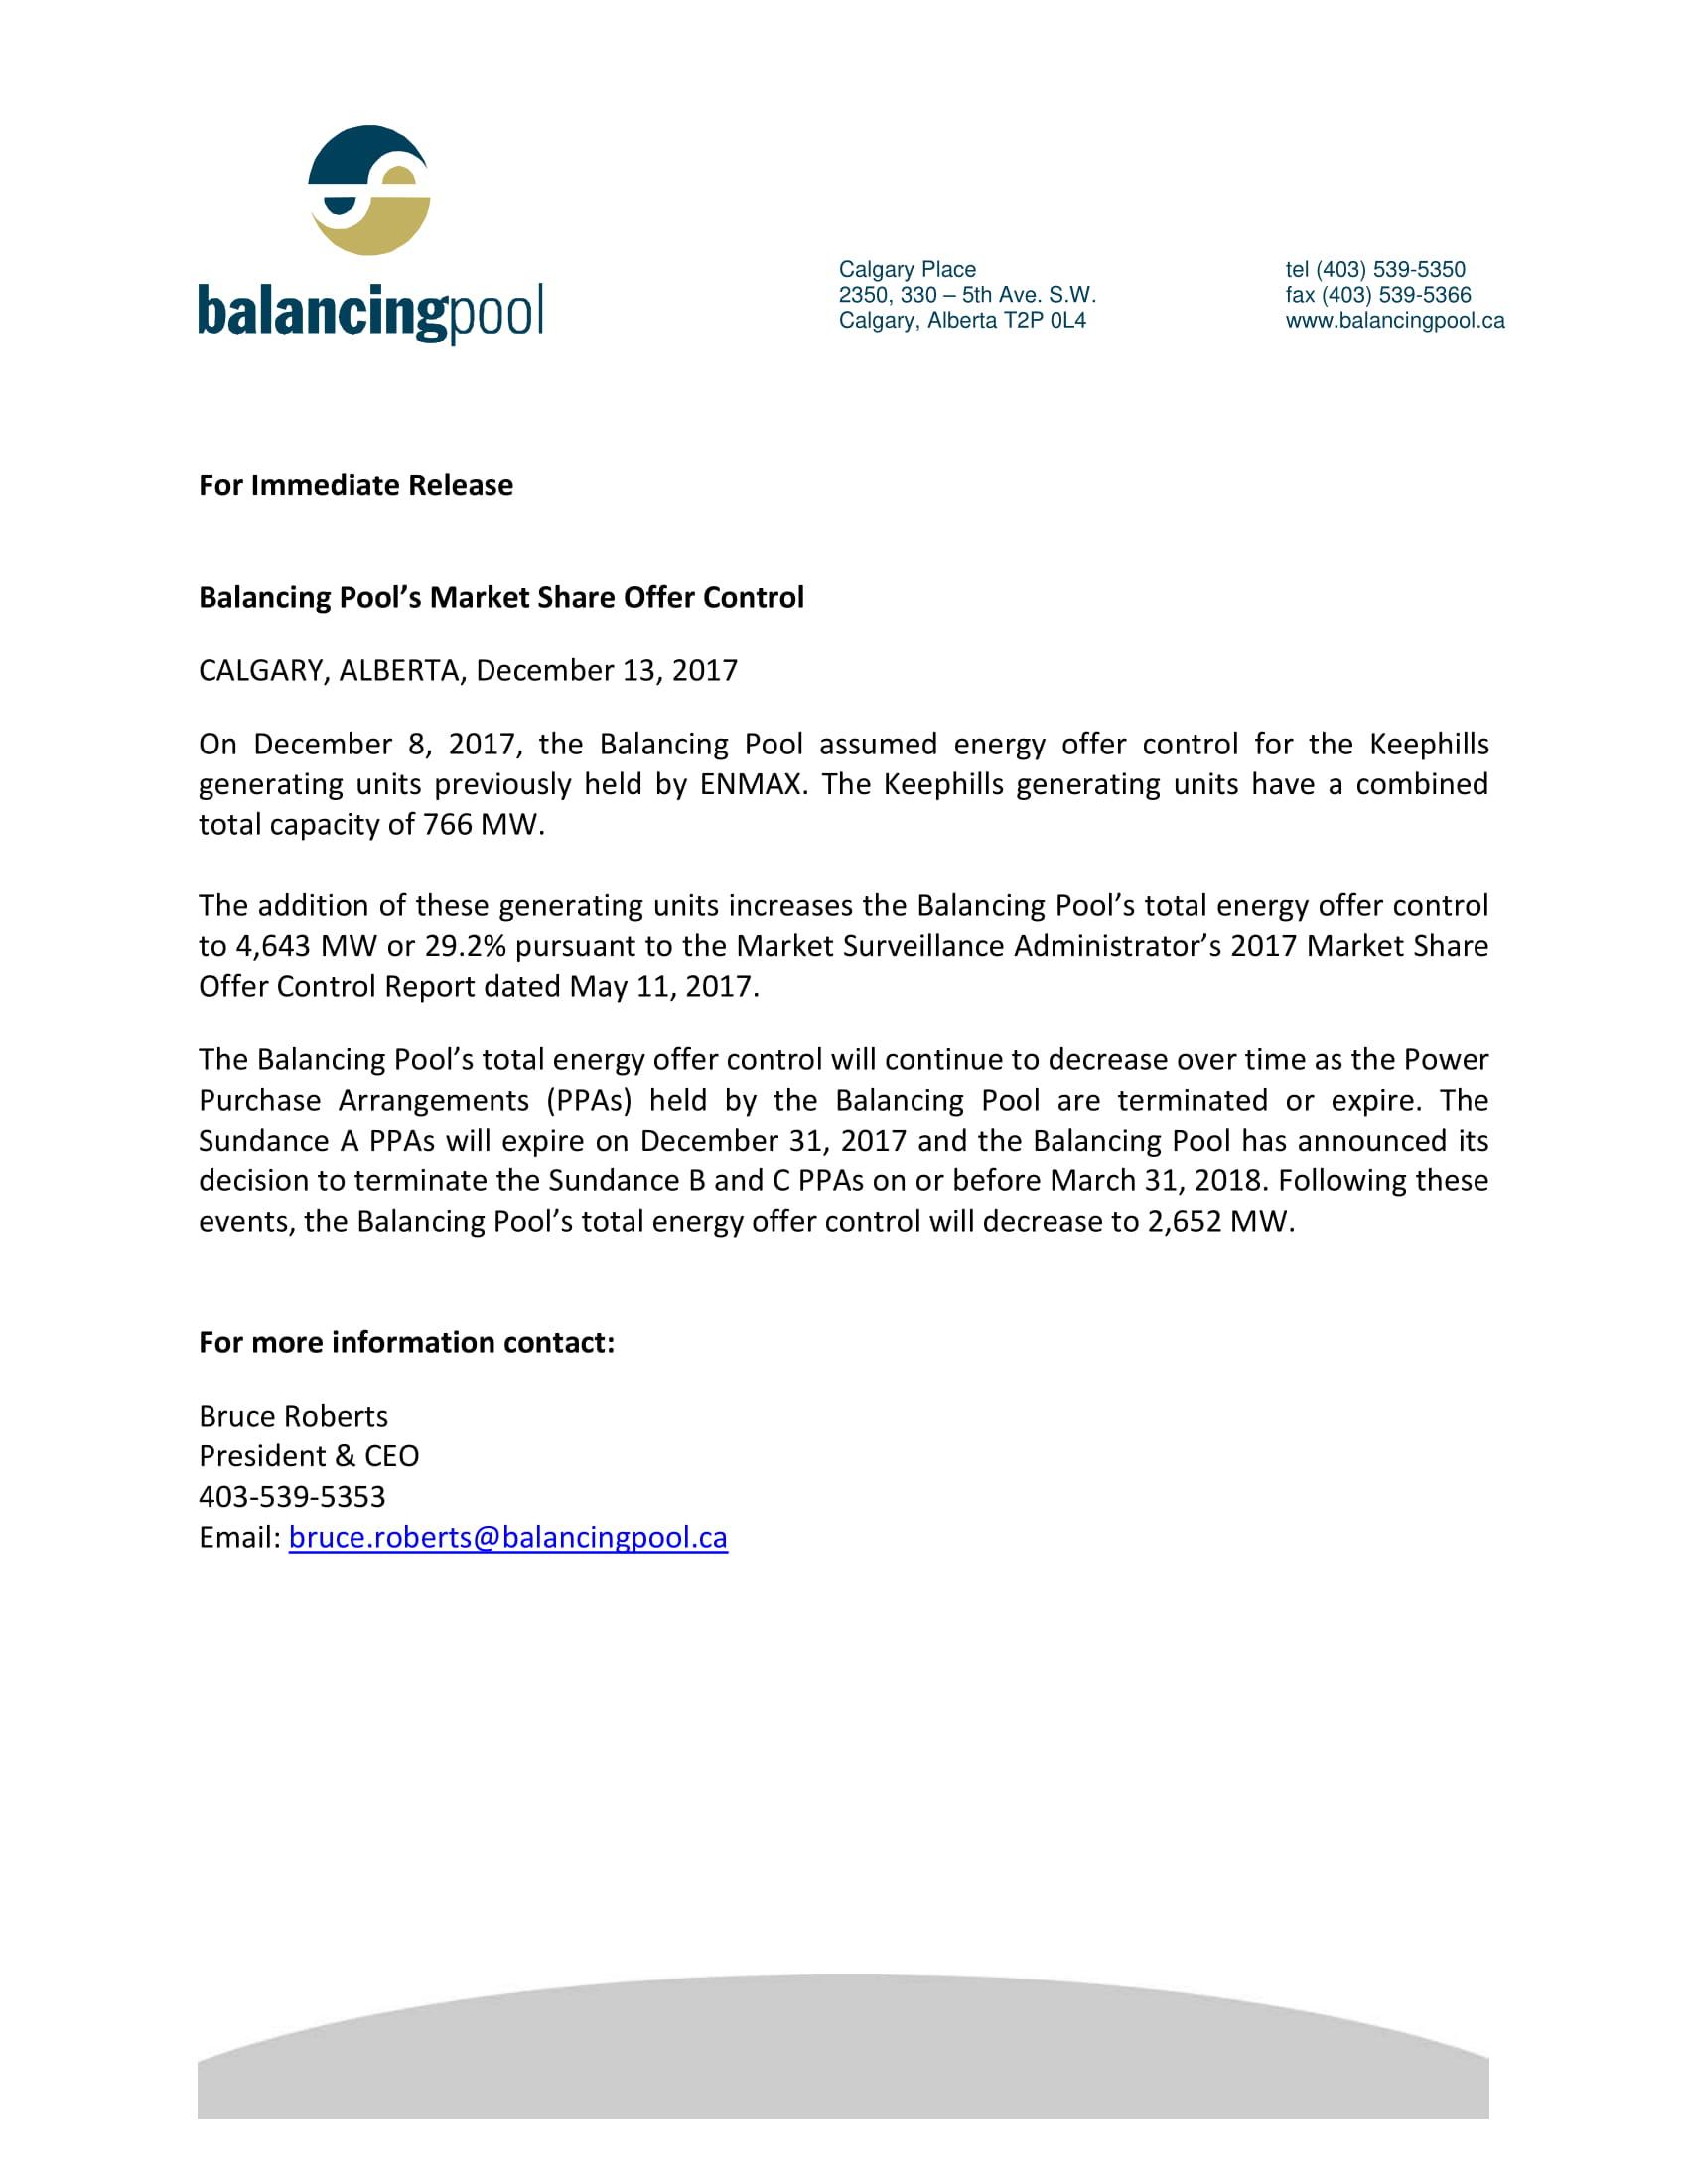 News Release BP Offer Control Dec 13